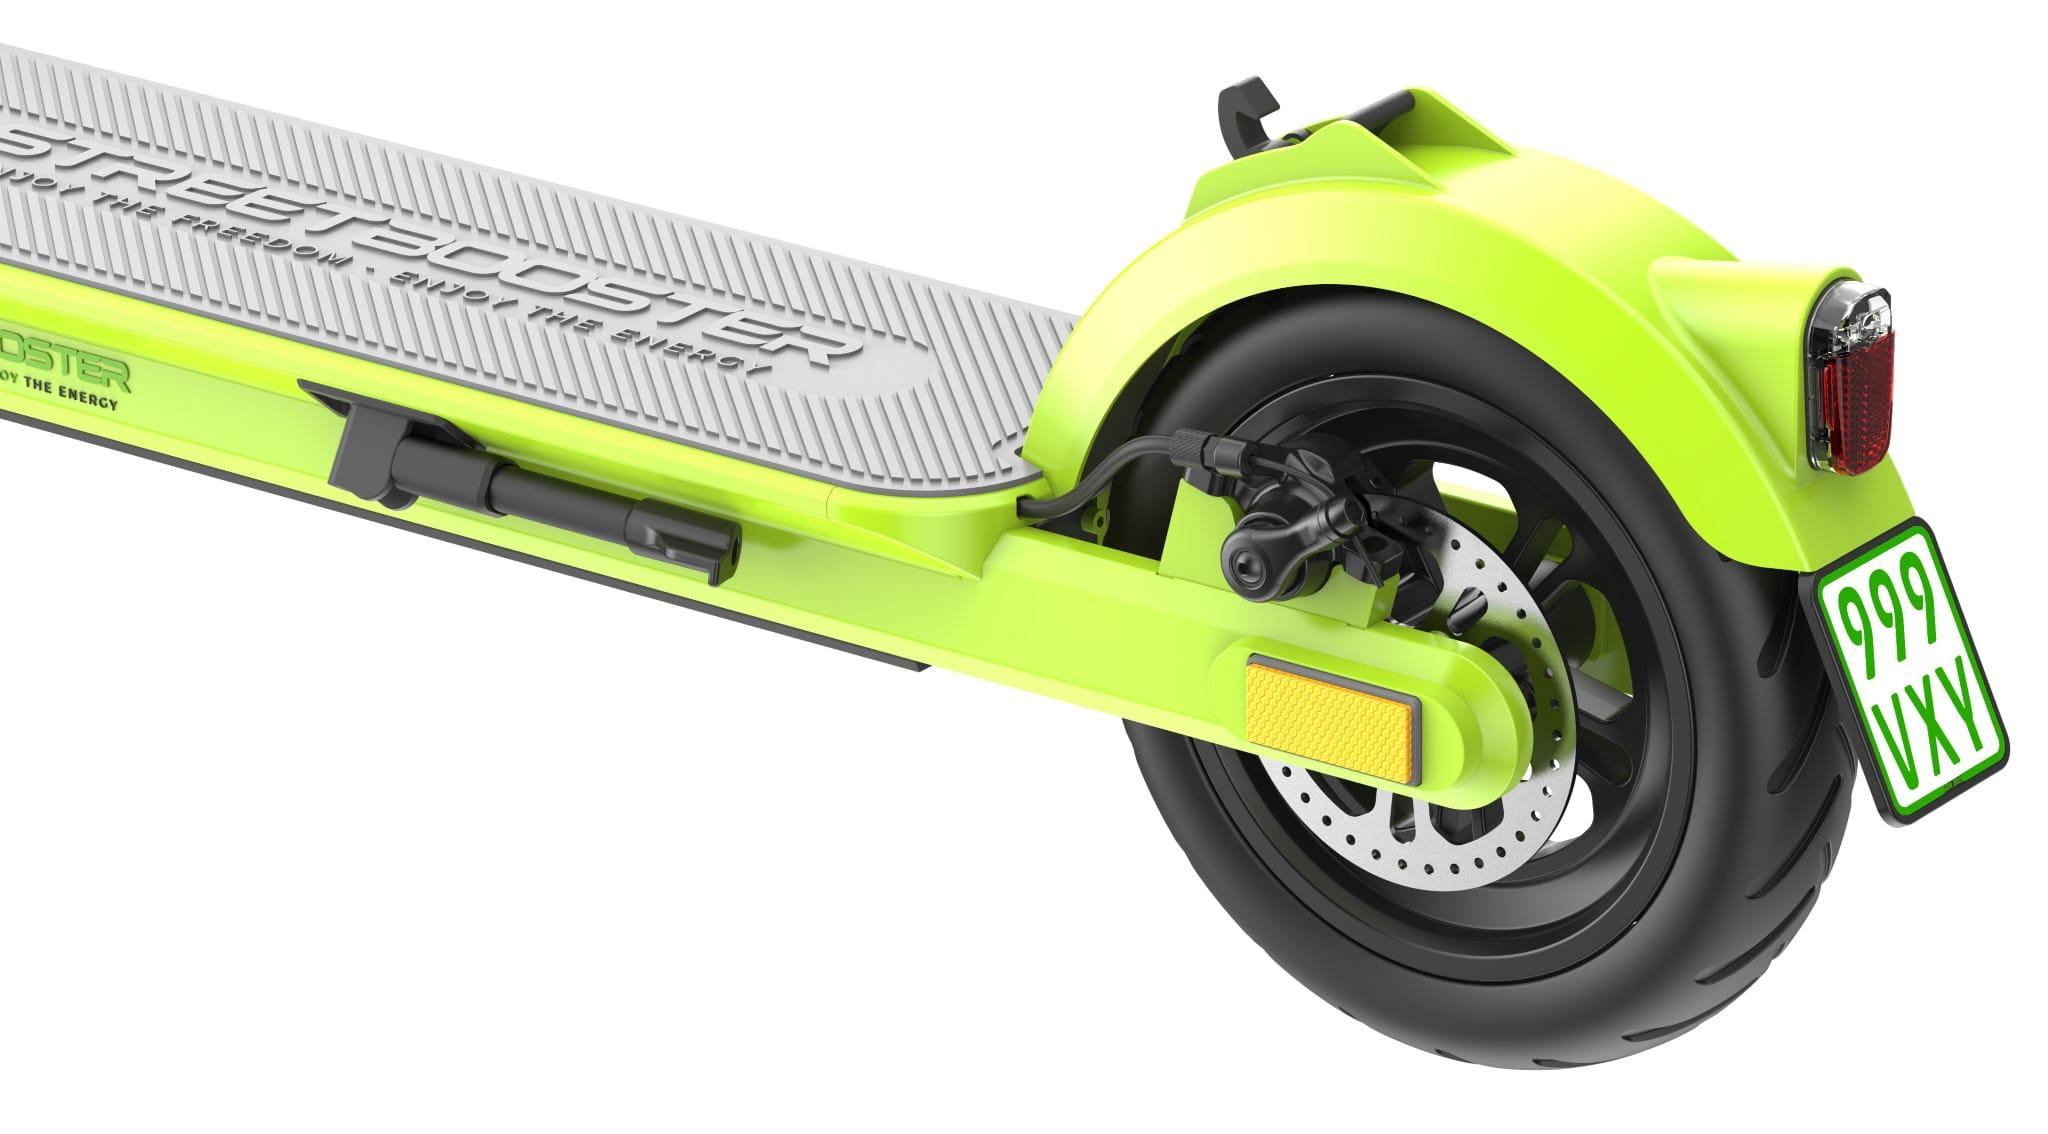 streetbooster-one hinterrad bremse